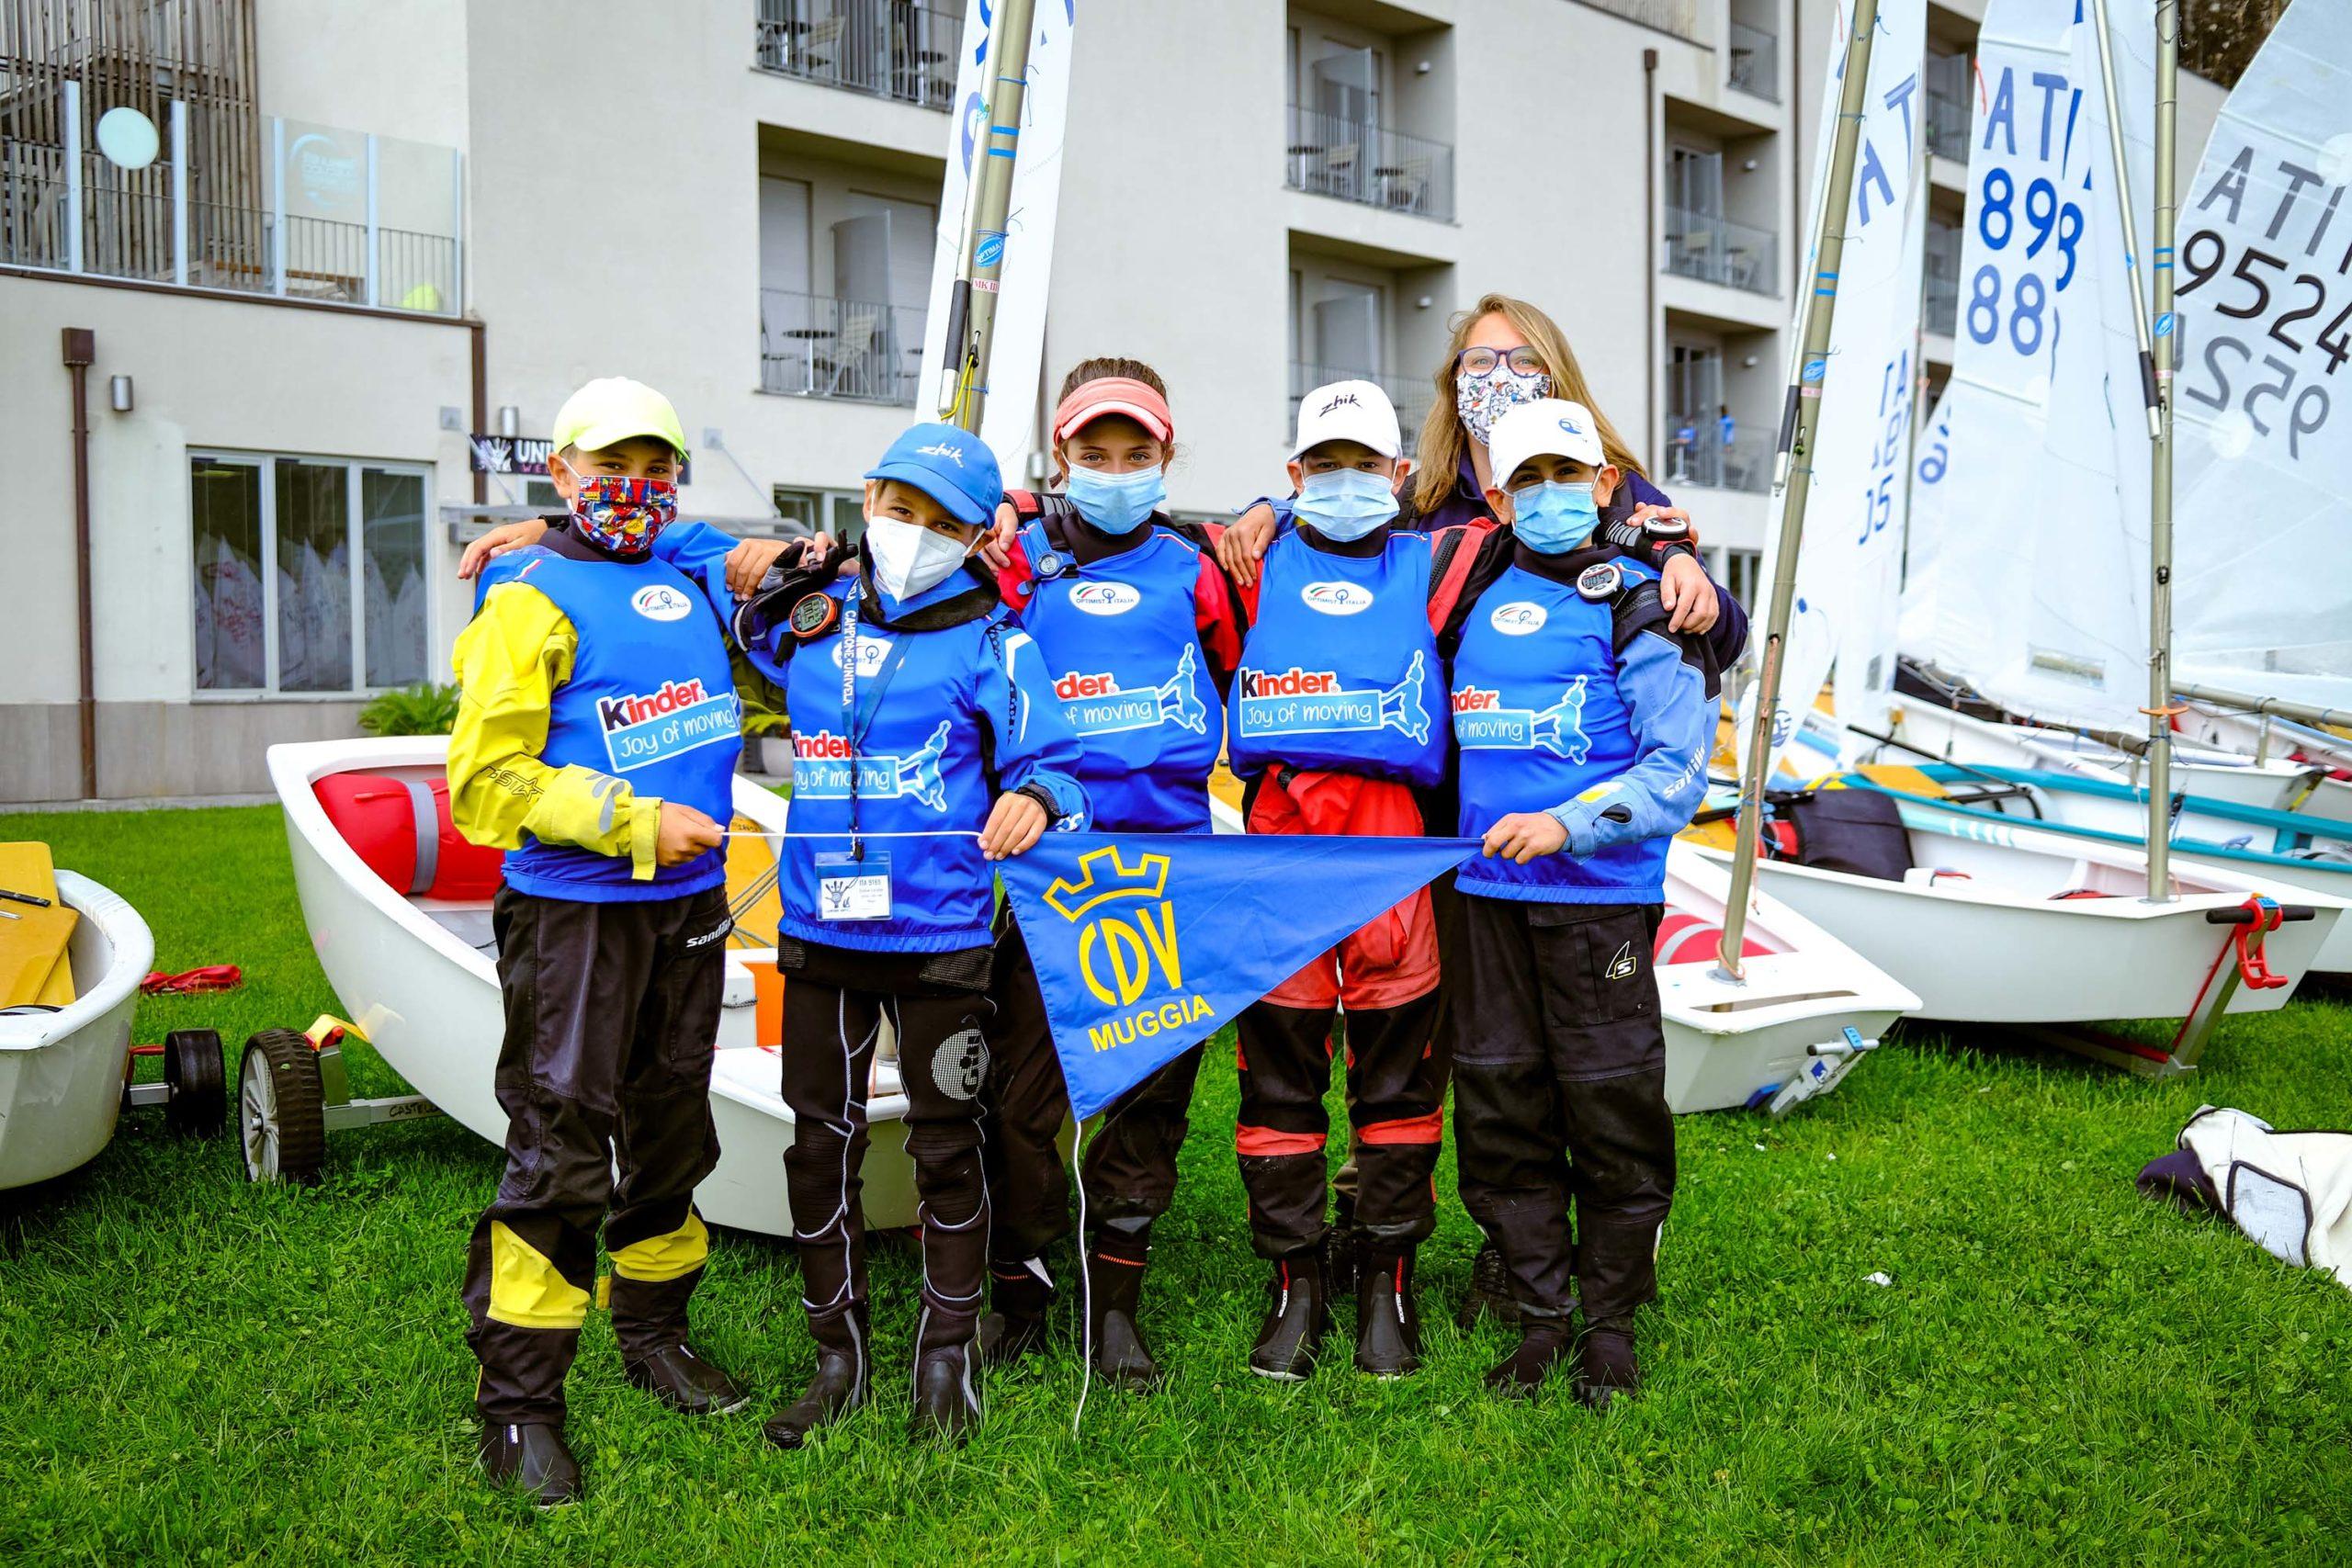 #KinderJoyofMoving - Univela Sailing, SCG Salò